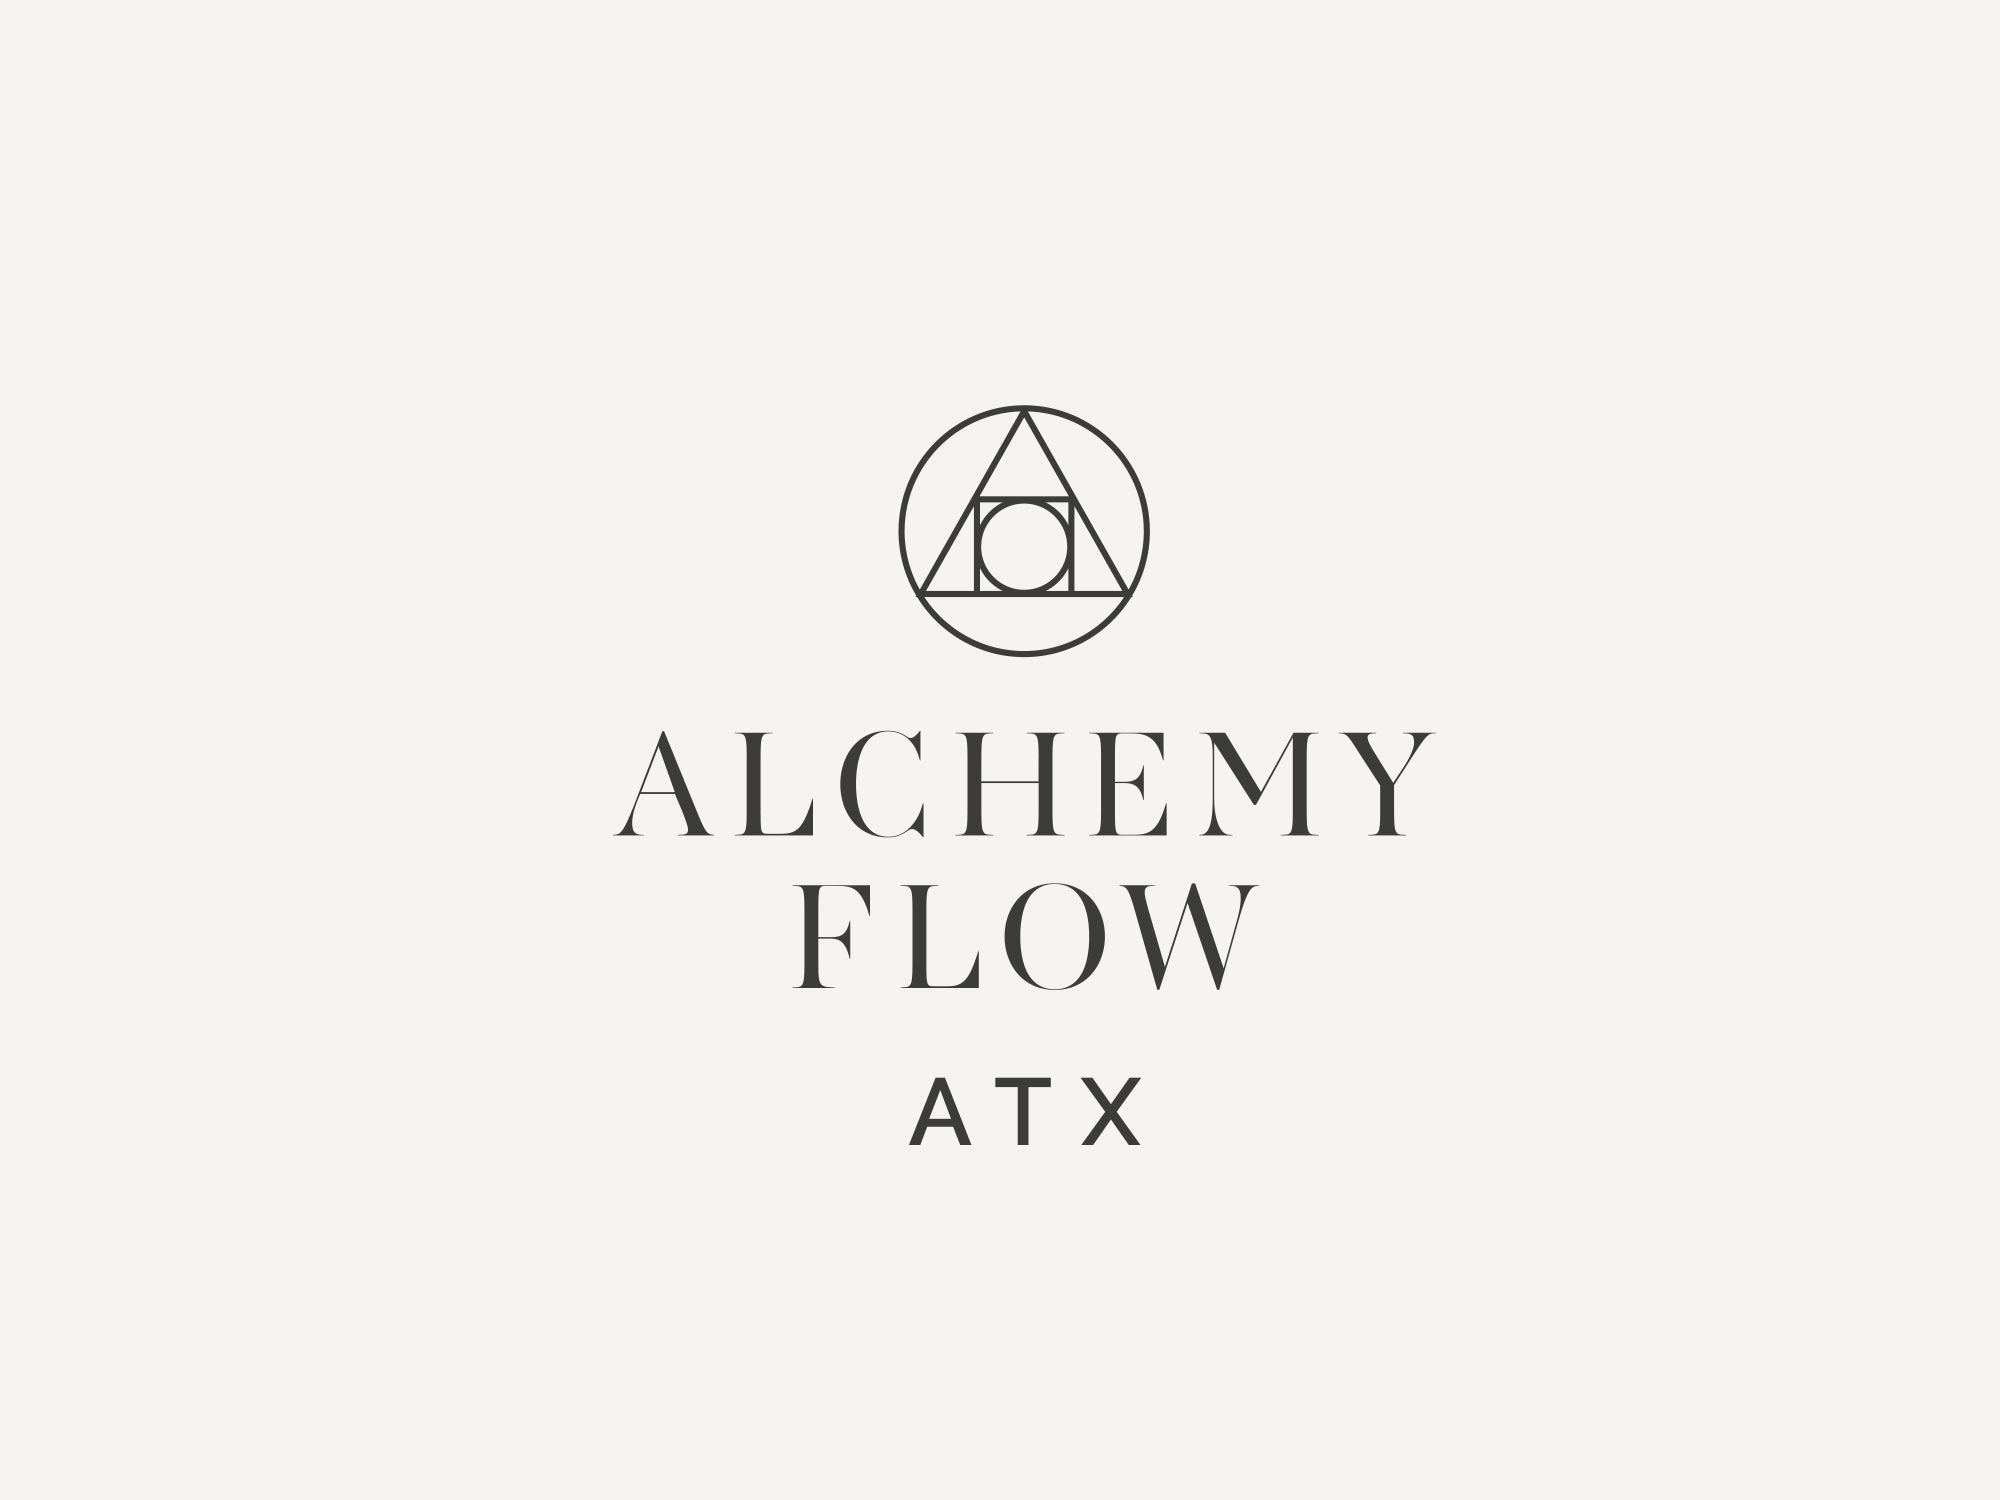 TheWildlyDesign-logo-alchemy-flow.jpg